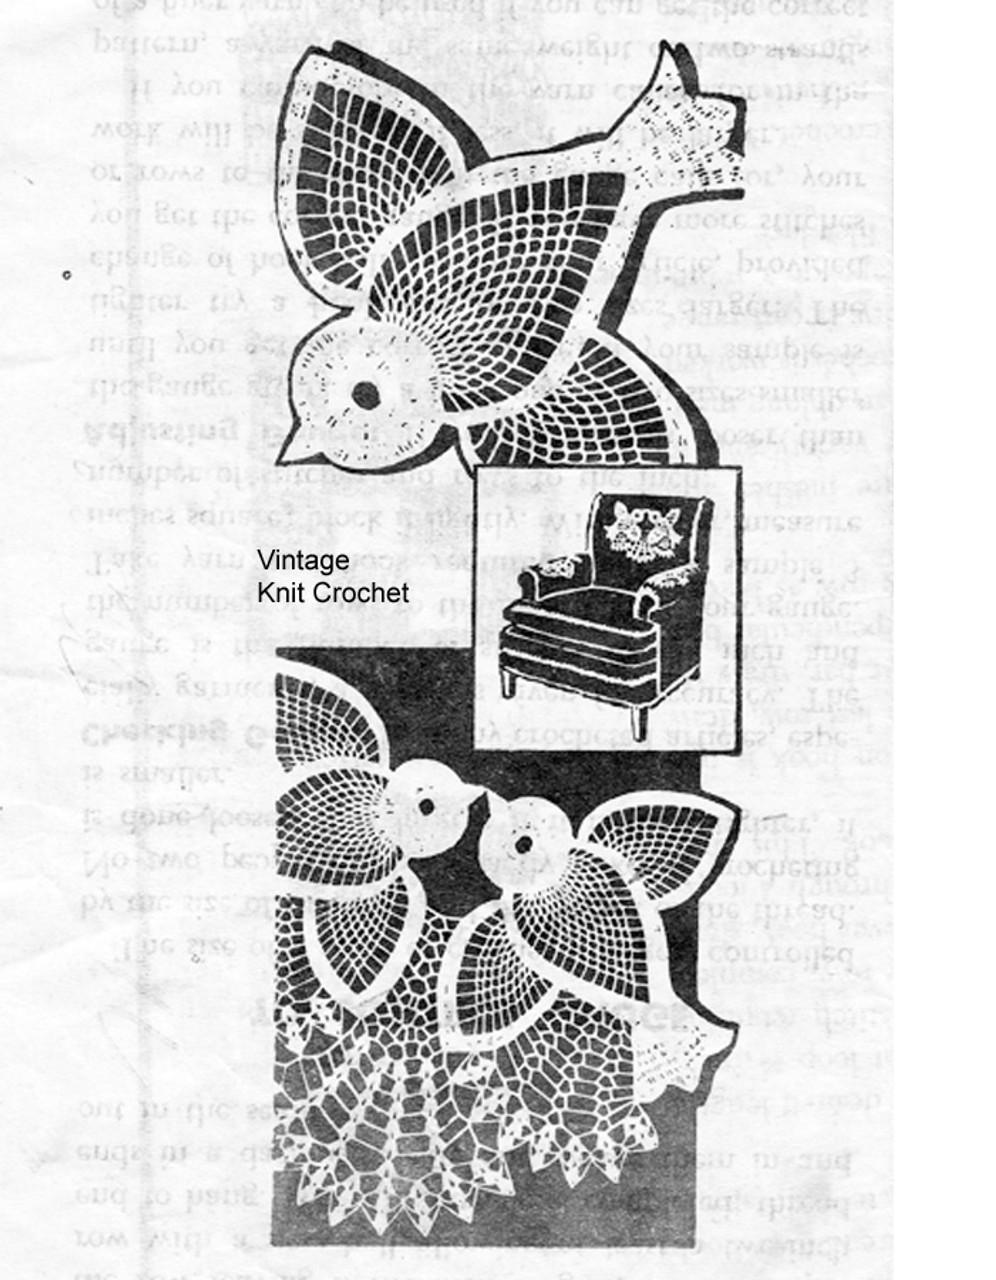 Two pineapple birds crochet chair Doily Set, Alice Brooks 7188